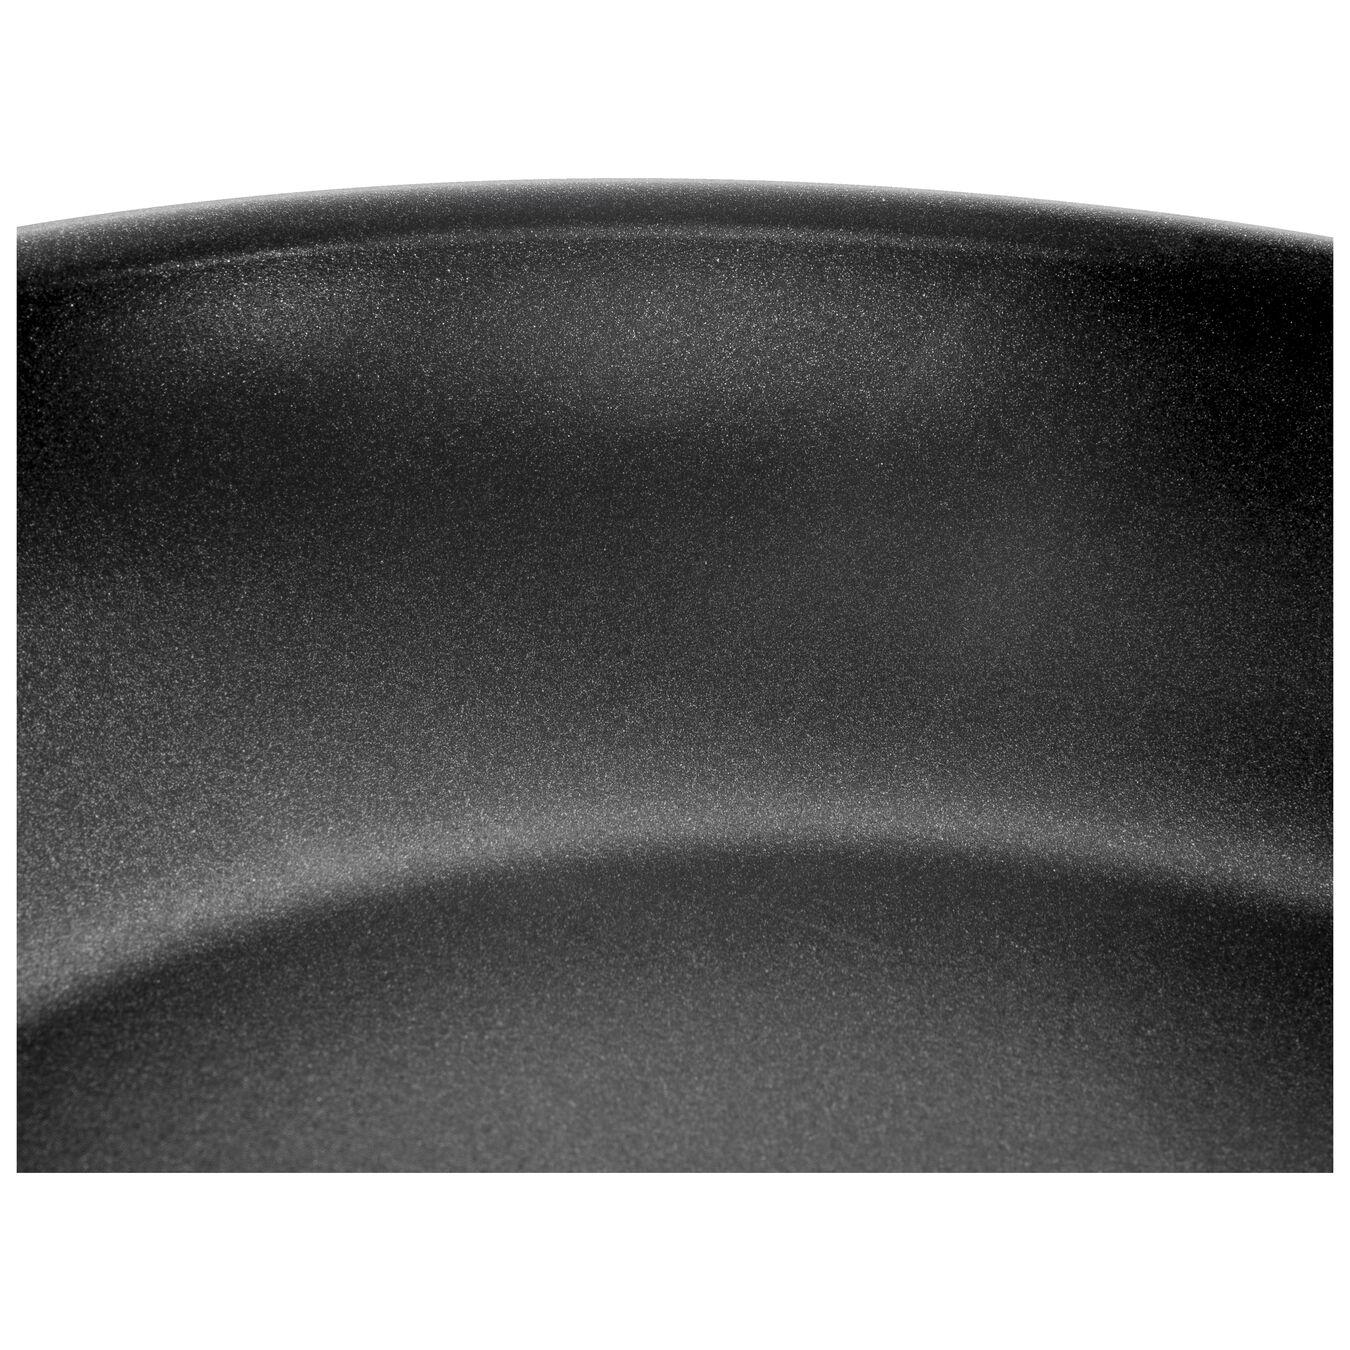 30 cm / 12 inch Aluminum Frying pan,,large 4